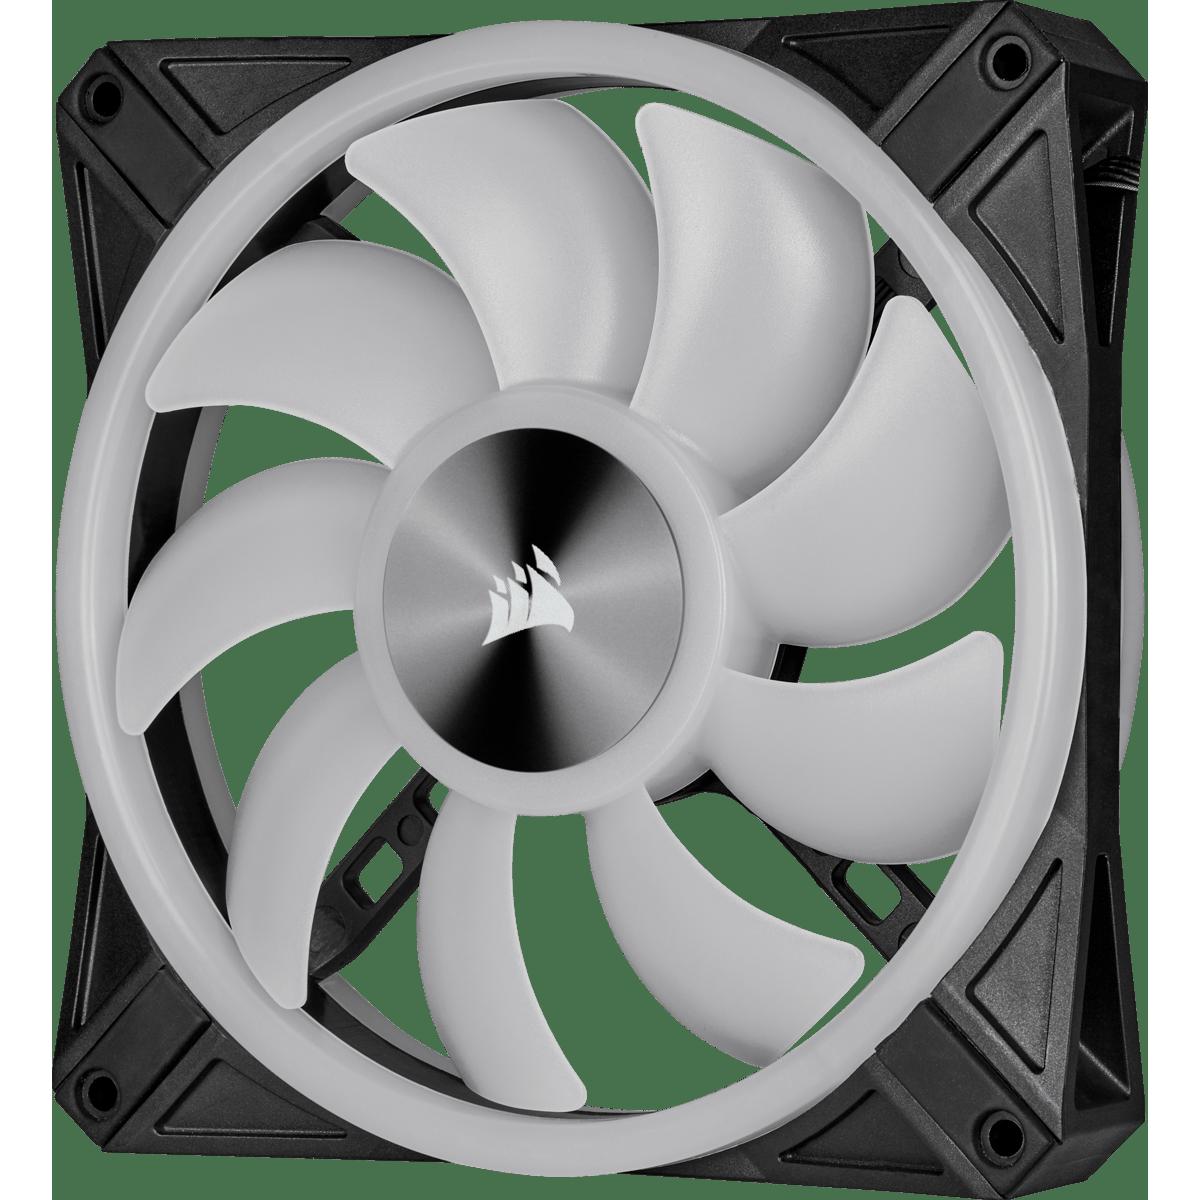 Cooler Para Gabinete Corsair RGB, 140mm RGB LED Fan, Dual Pack with Lighting CO-9050100-WW